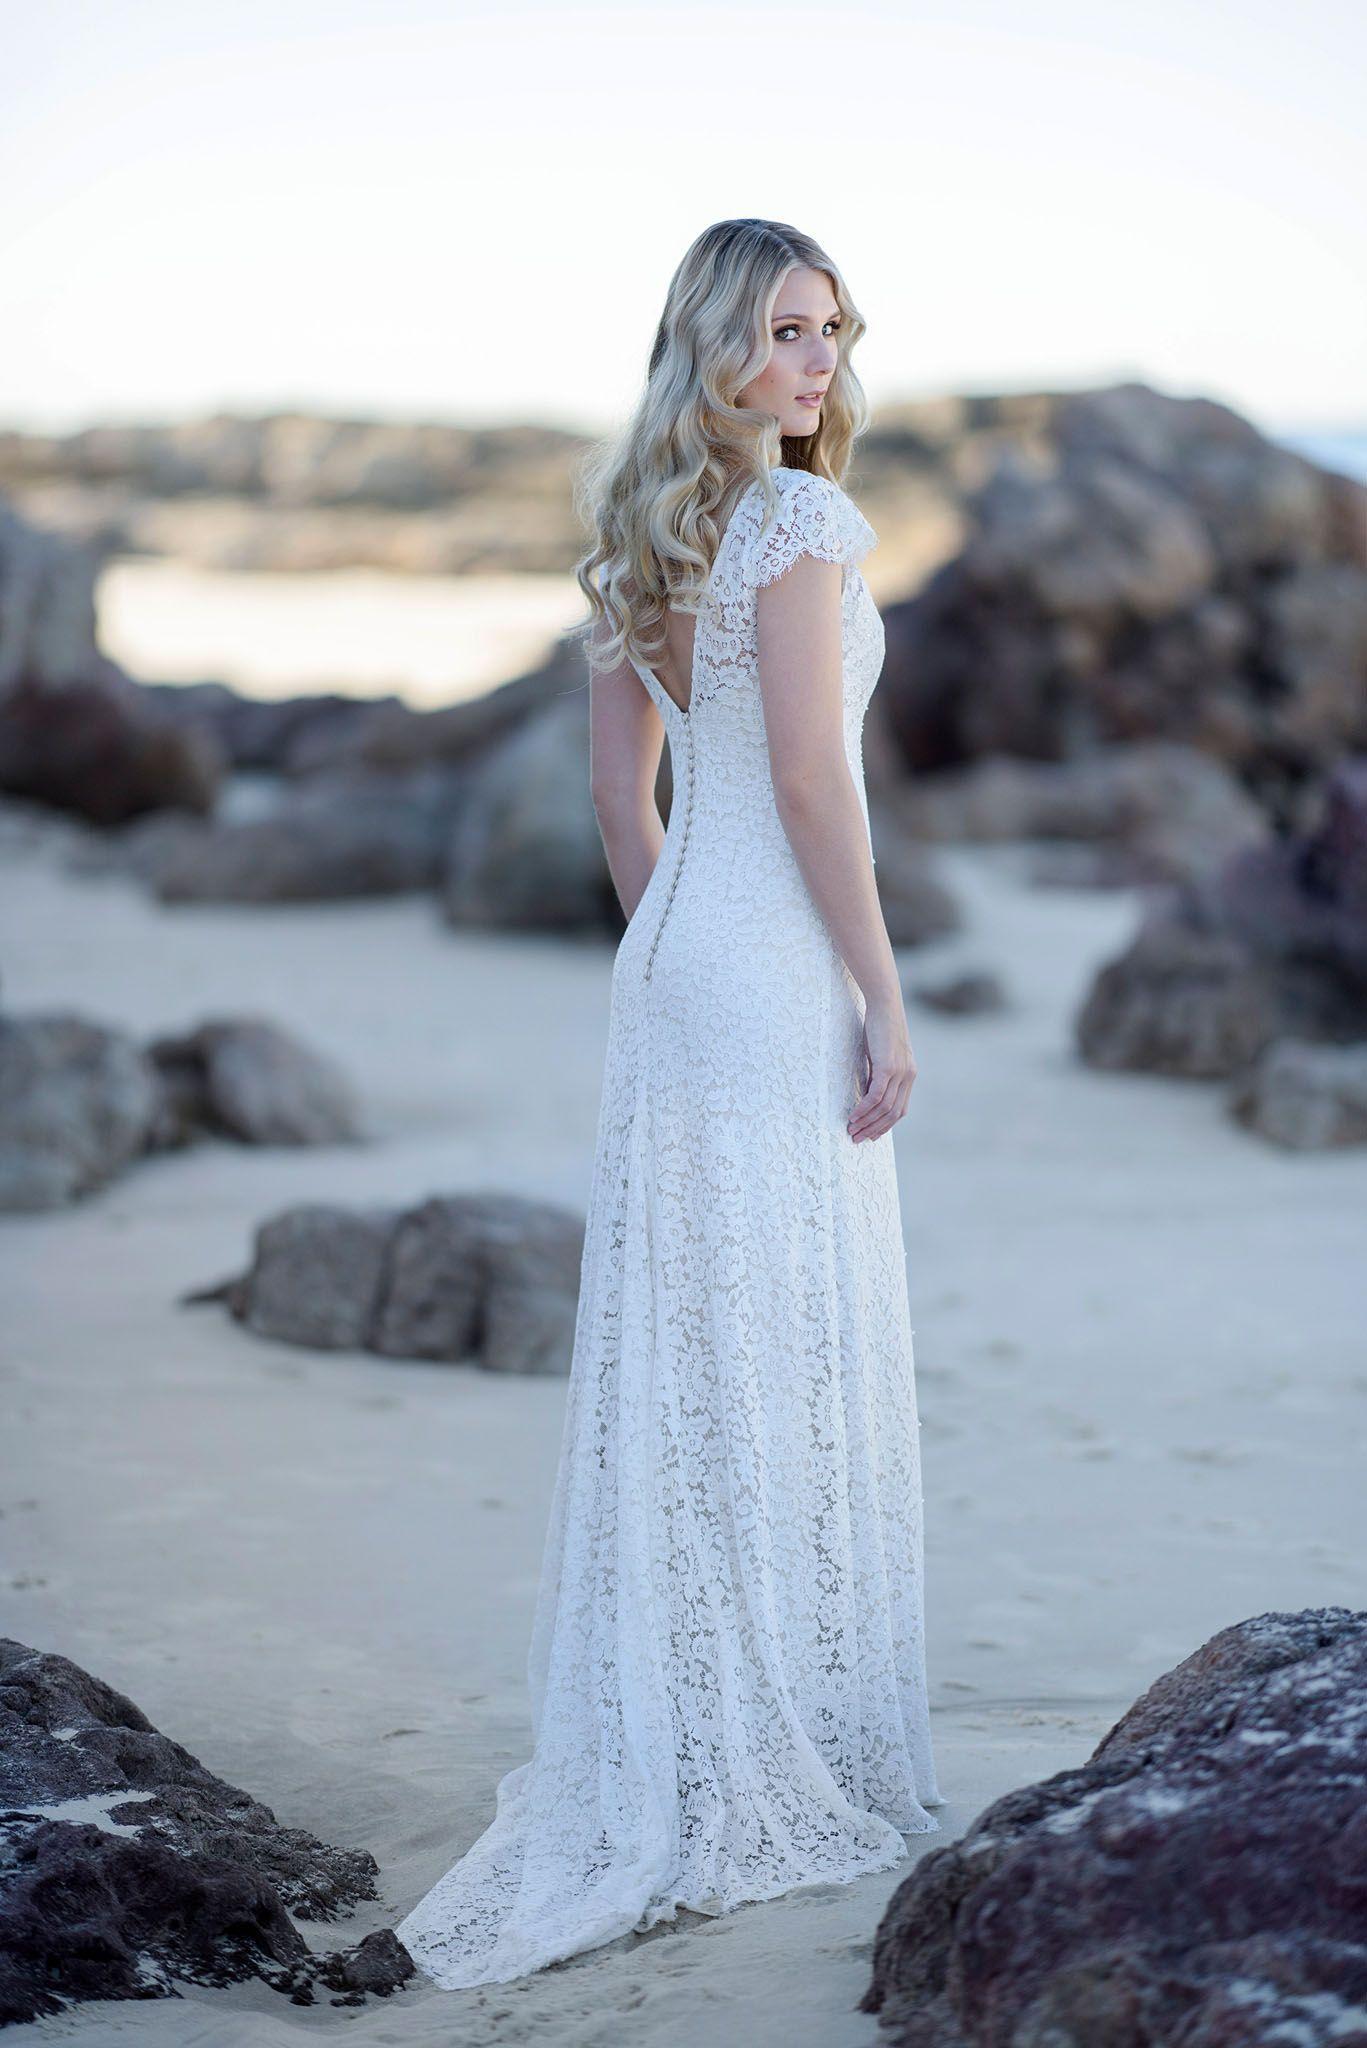 Fleur wedding dress  Introducing our stunning uFleuru Bertossi Brides wedding gown